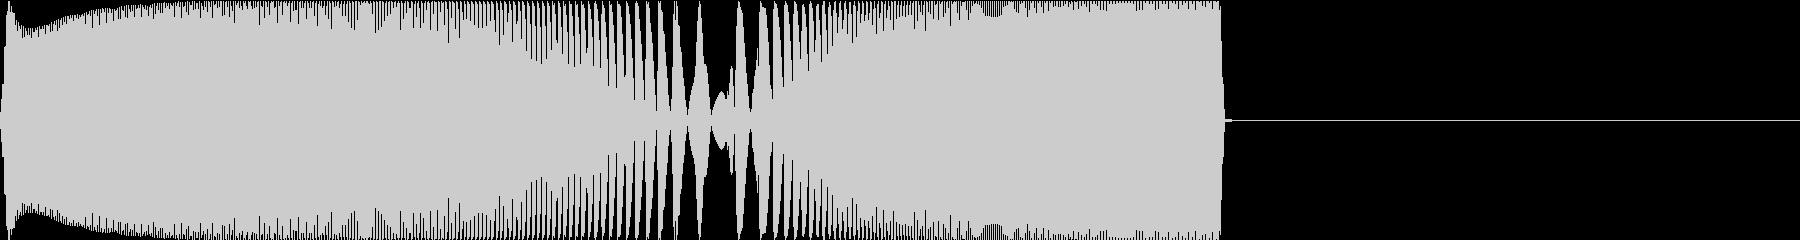 Game レトロなゲームコマンド音 2の未再生の波形